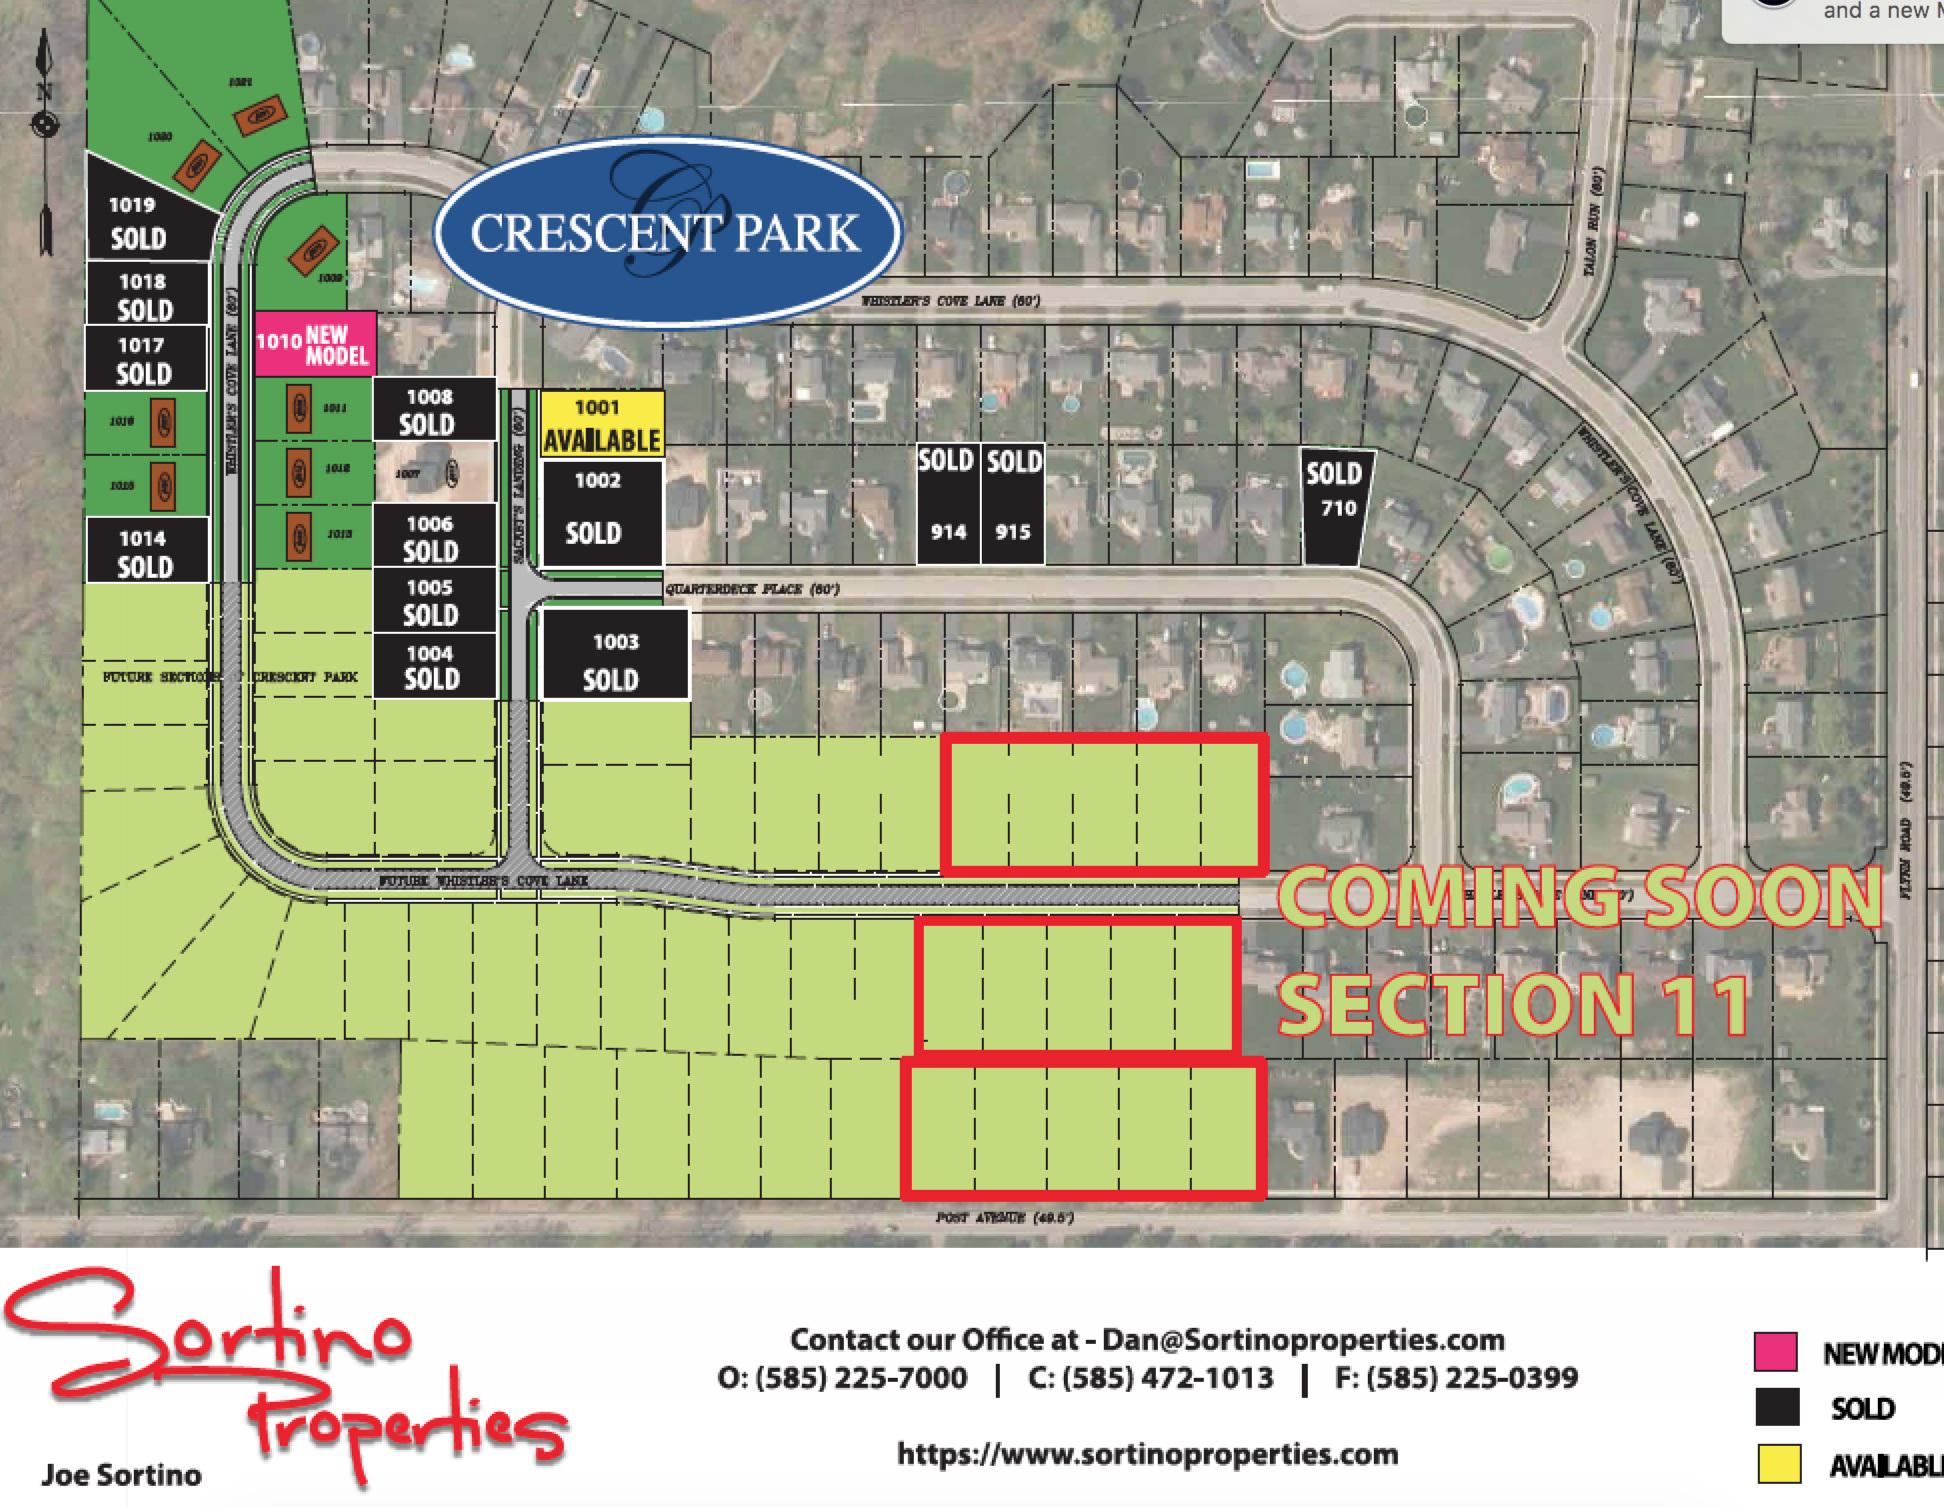 Crescent-Park-Site-Map.jpg